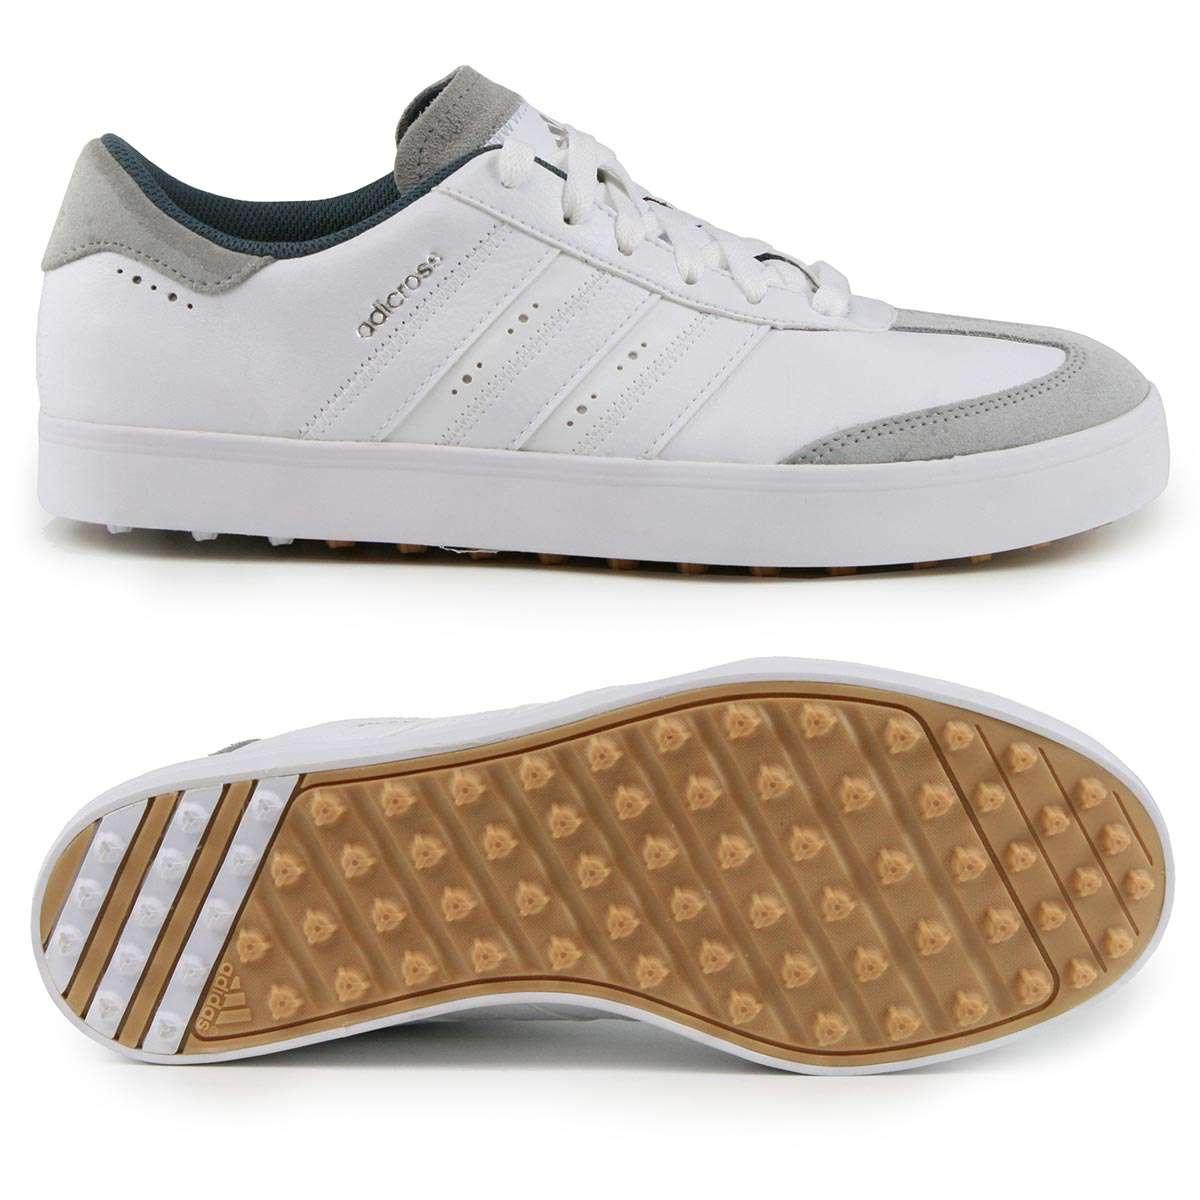 pretty nice 1a1b0 6242f Adidas adicross V Herren Golfschuhe, WIDE, Weiß  Grau günstig kaufen   Golflädchen